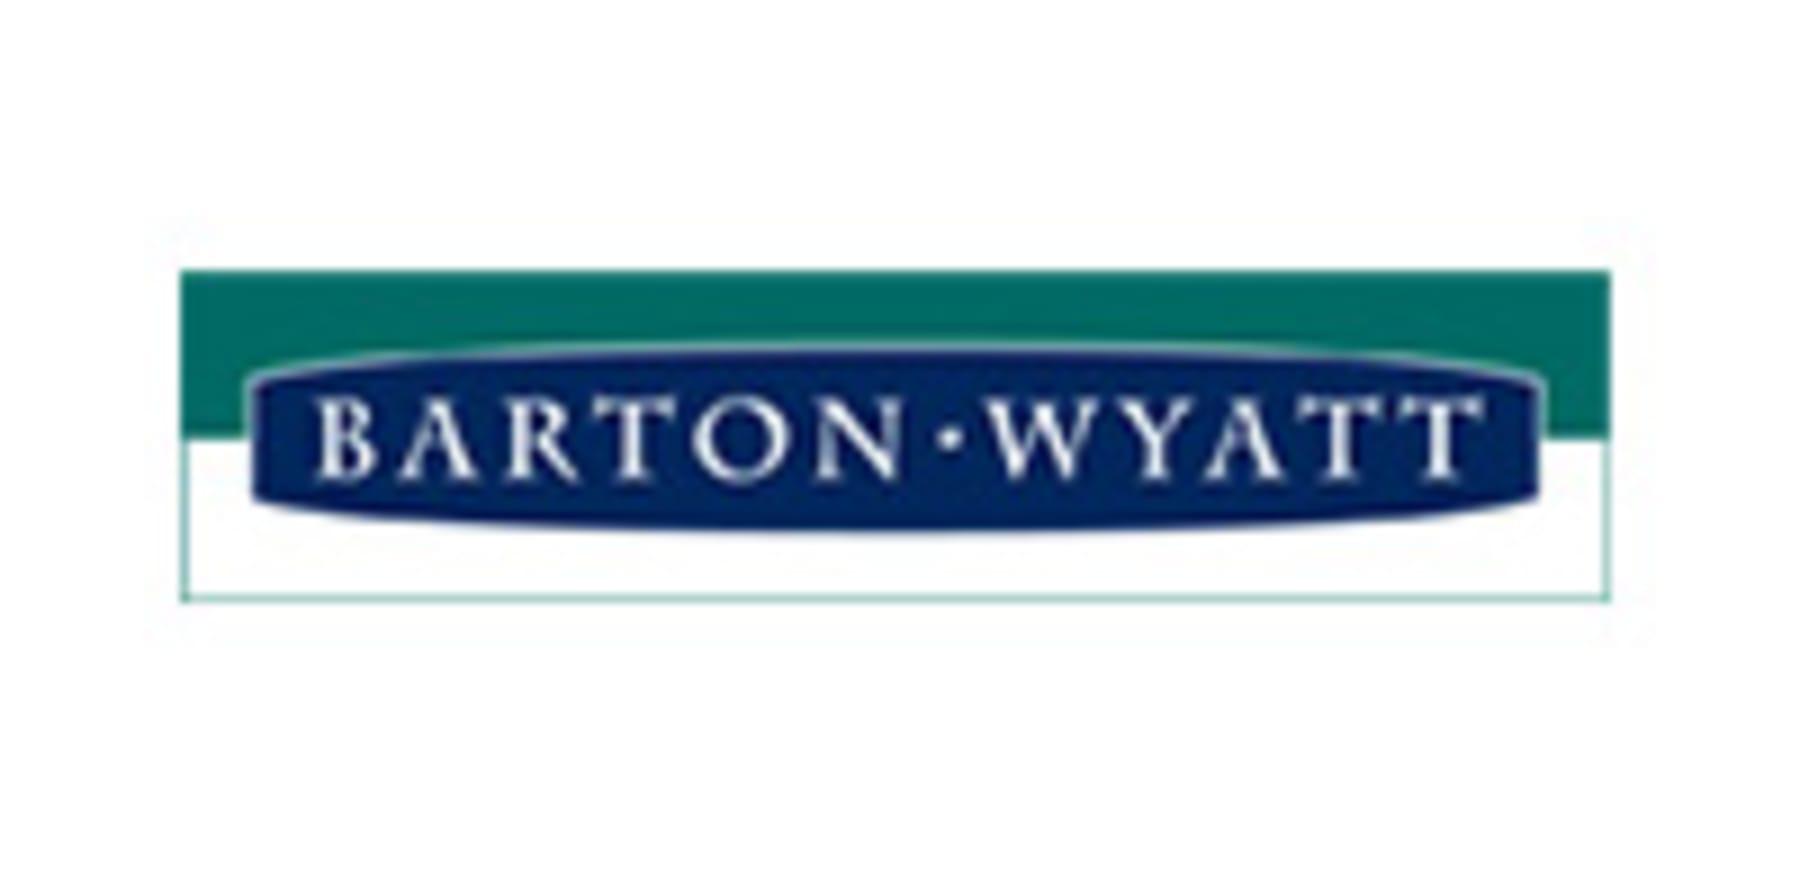 Barton Wyatt